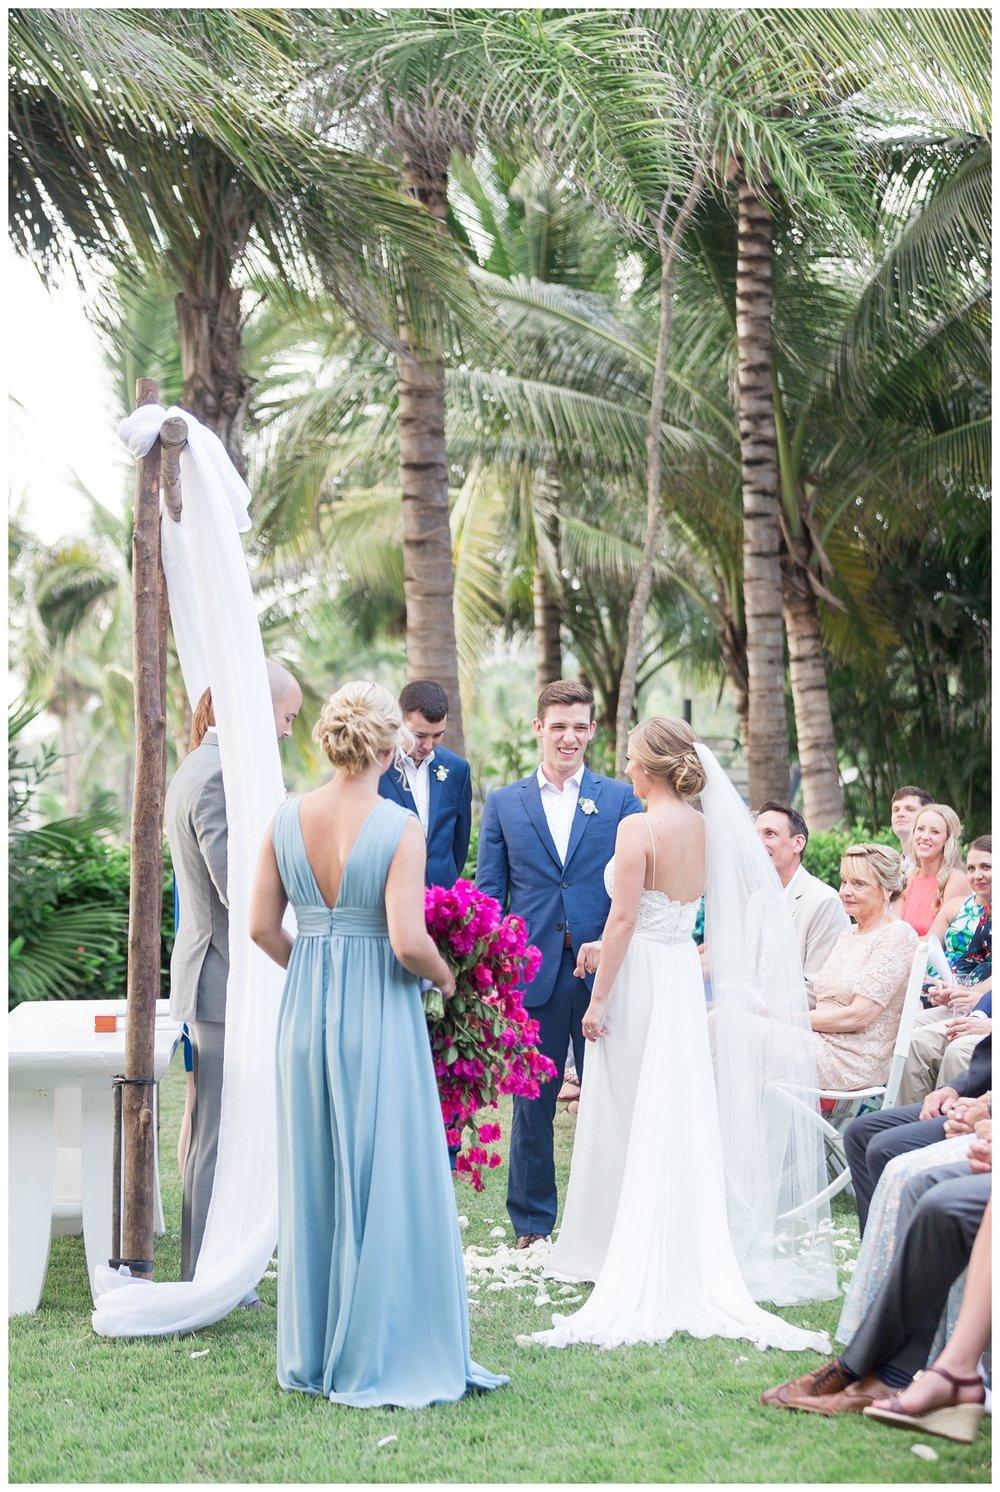 full photo of a wedding ceremony happening next to the beach in Puerto Vallarta Mexico